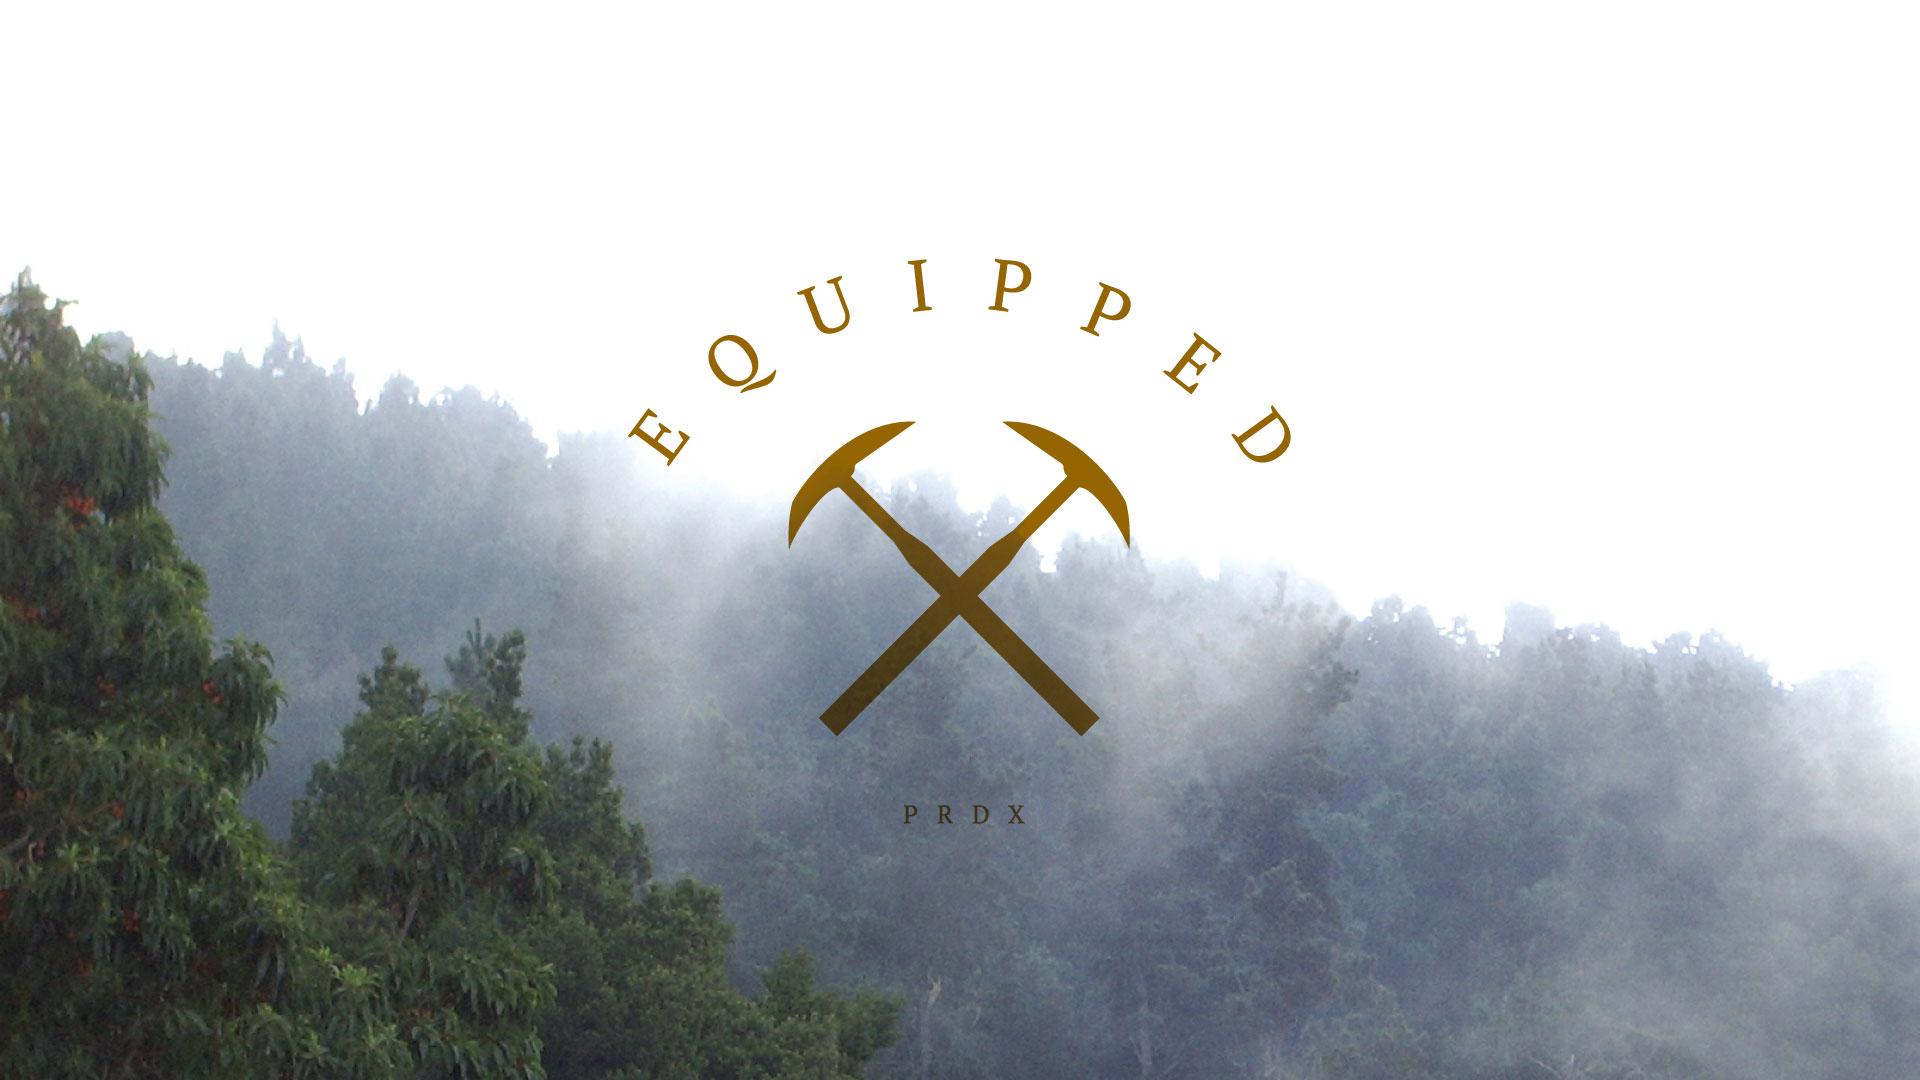 Equipped - • Five Sermons• Five Gospel-Centered Practices• Five Preachers